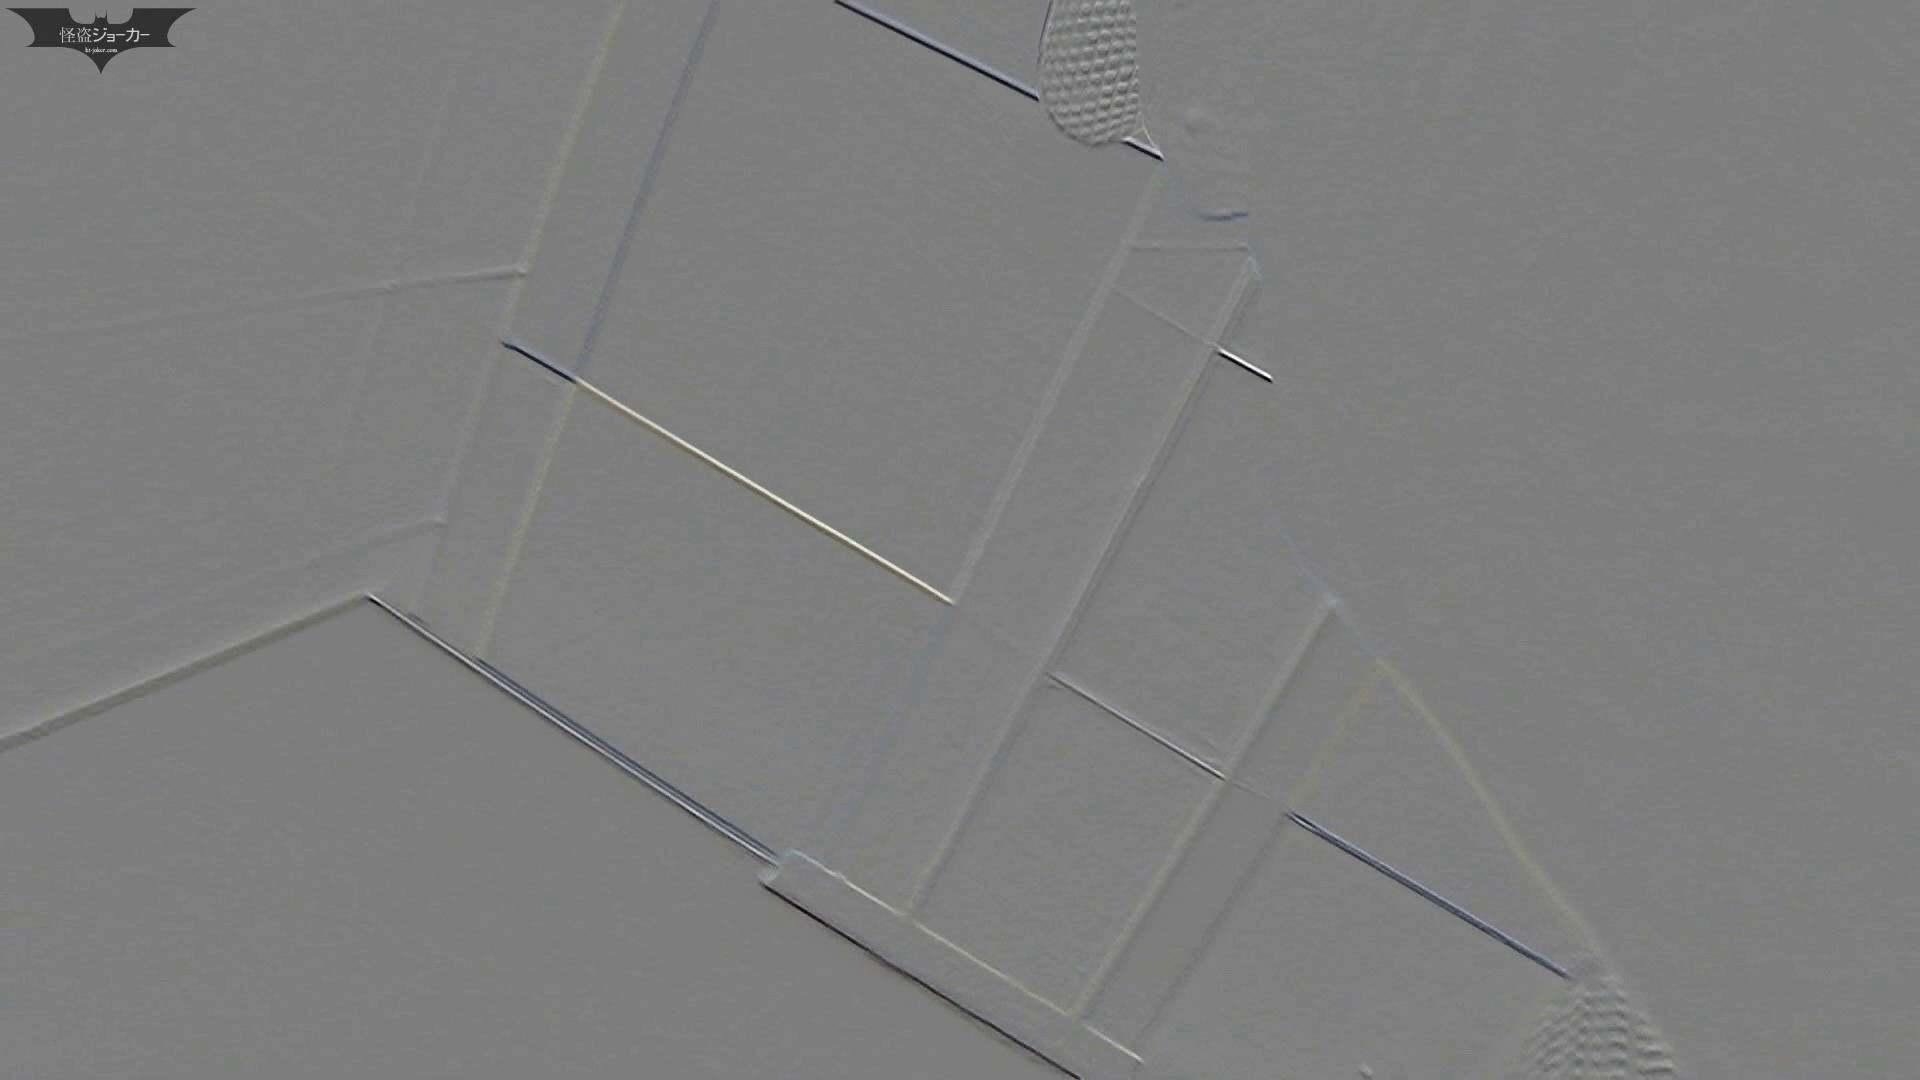 Vol.06 ピチピチが入室きめ細かくマッシュルームのような肌に癒される 潜入   テクニック  65連発 28